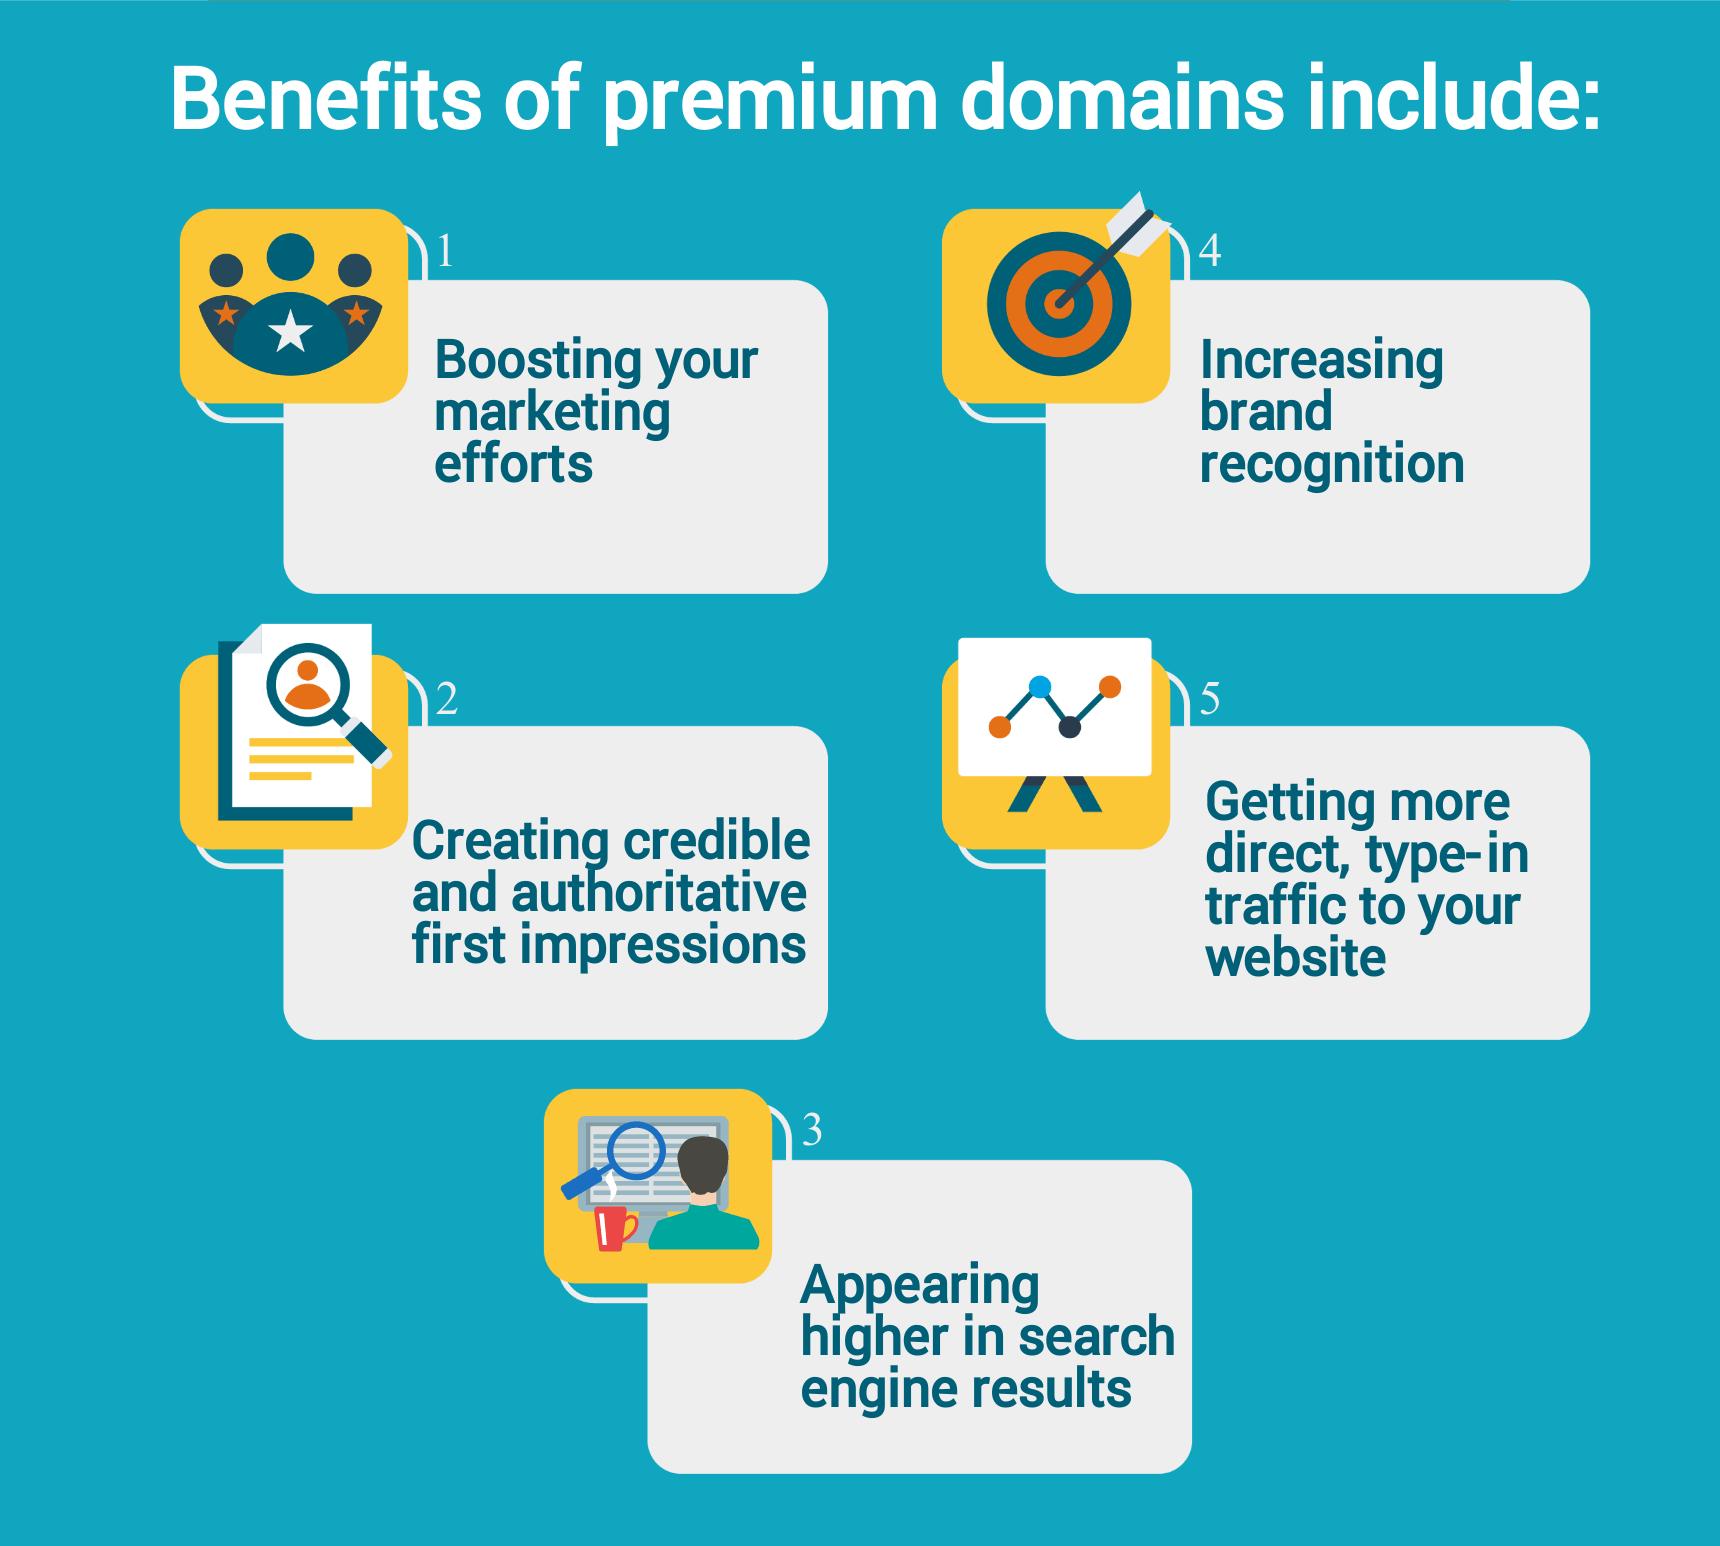 benefits of premium domains